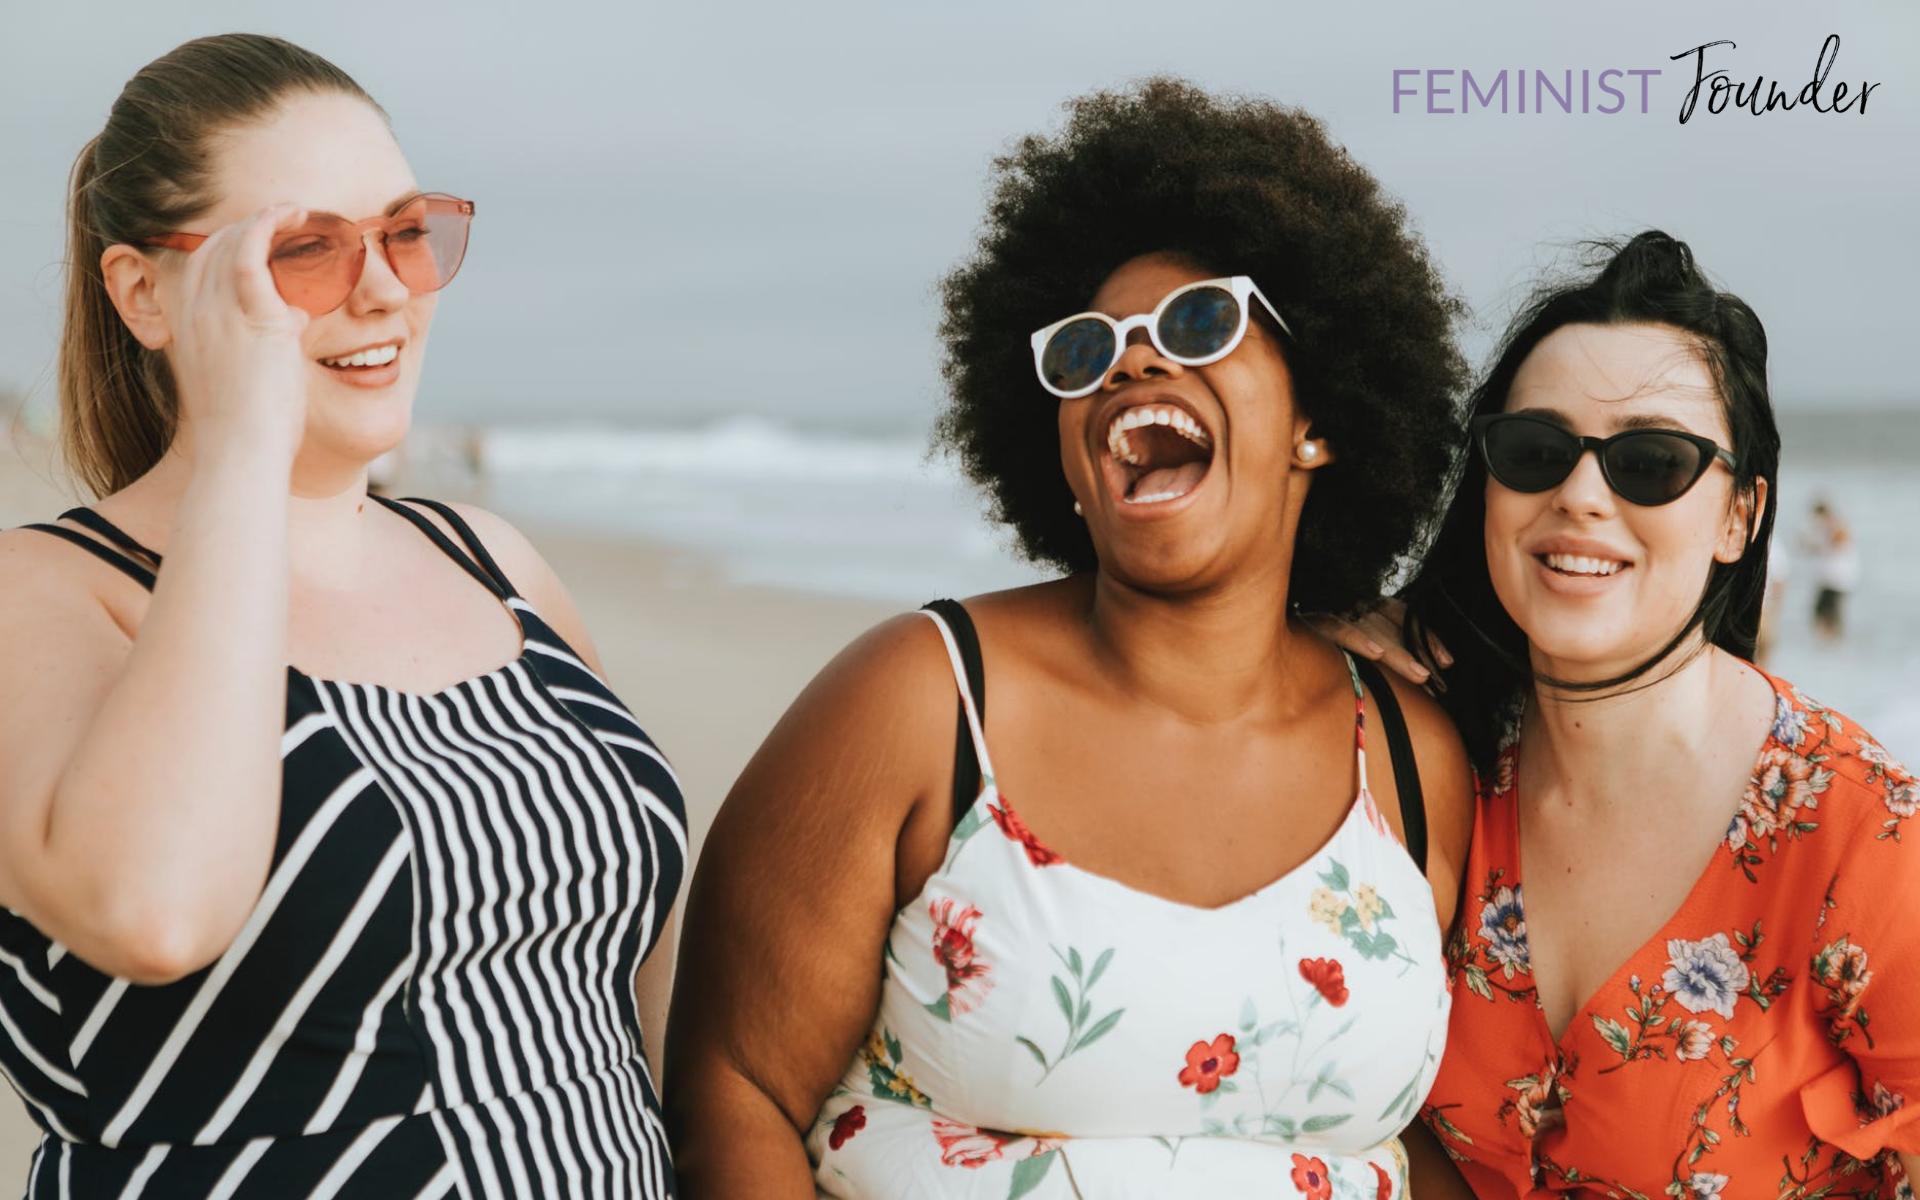 feminist mastermind, feminist accountability group